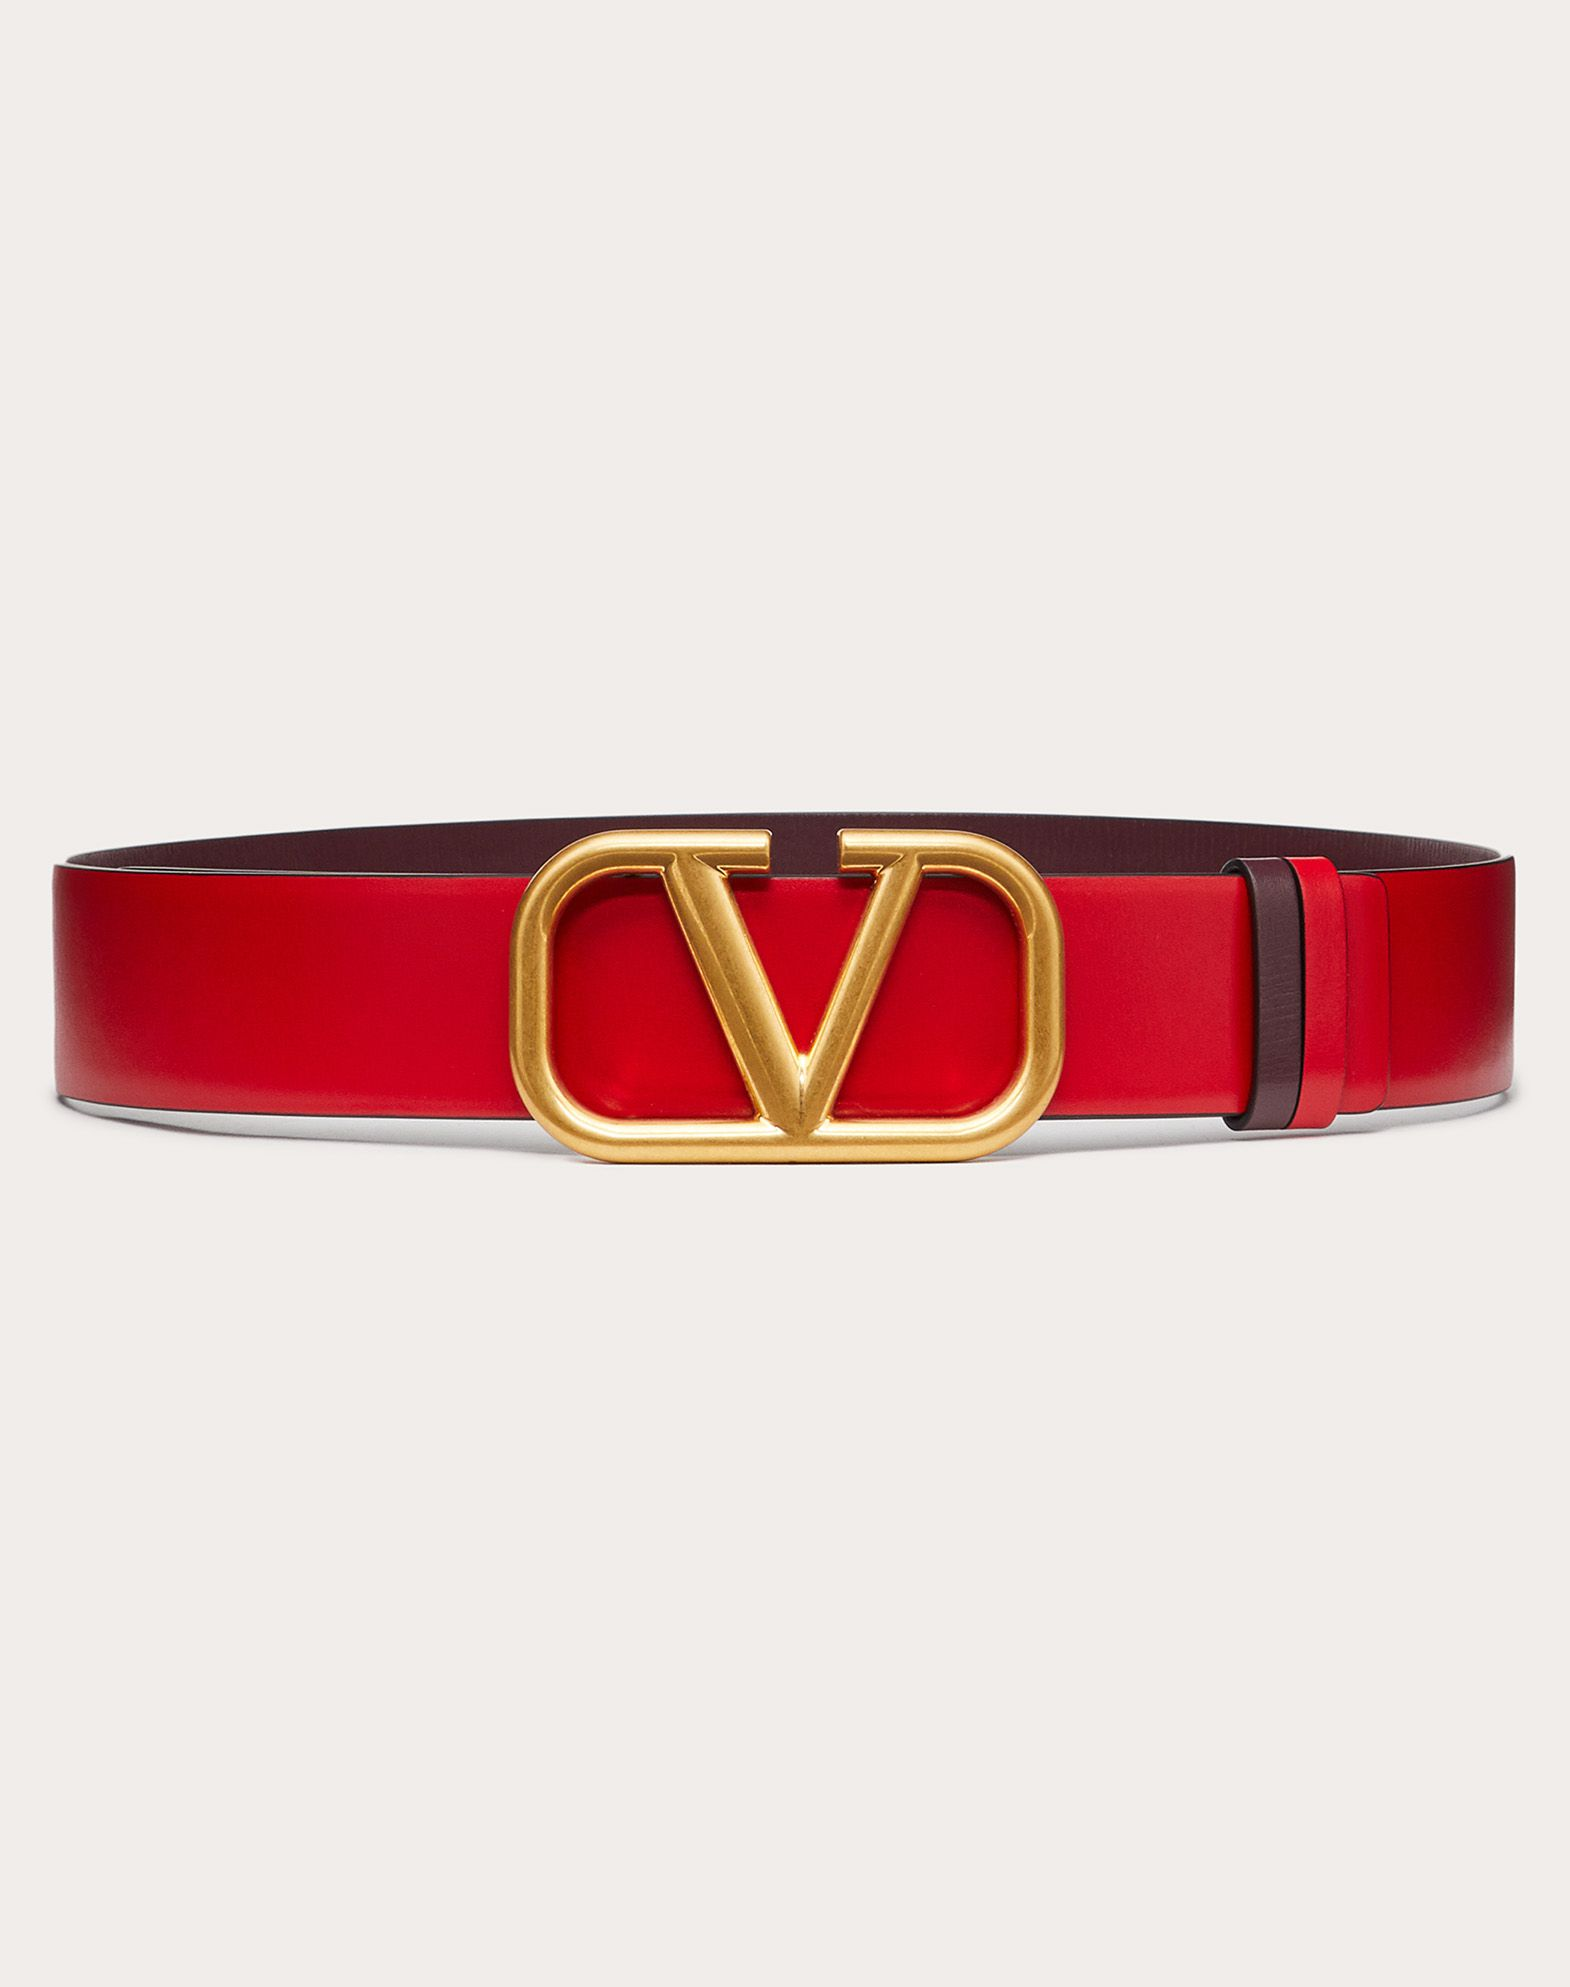 VALENTINO GARAVANI LOVE LAB Reversible Belt